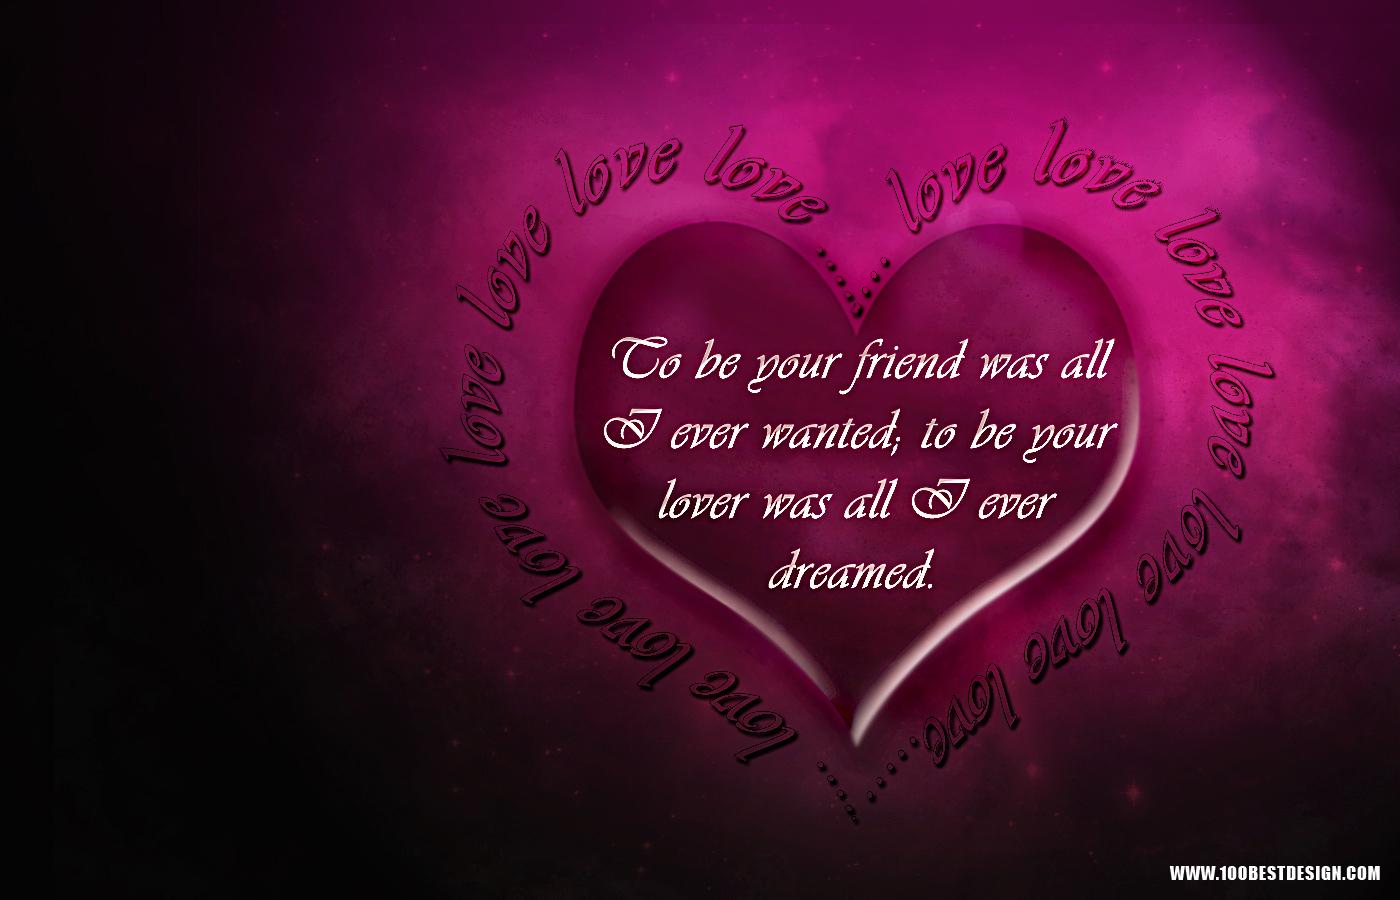 Valentines Day Love Quotes Wallpaper HD Deskto 17384 Wallpaper 1400x900